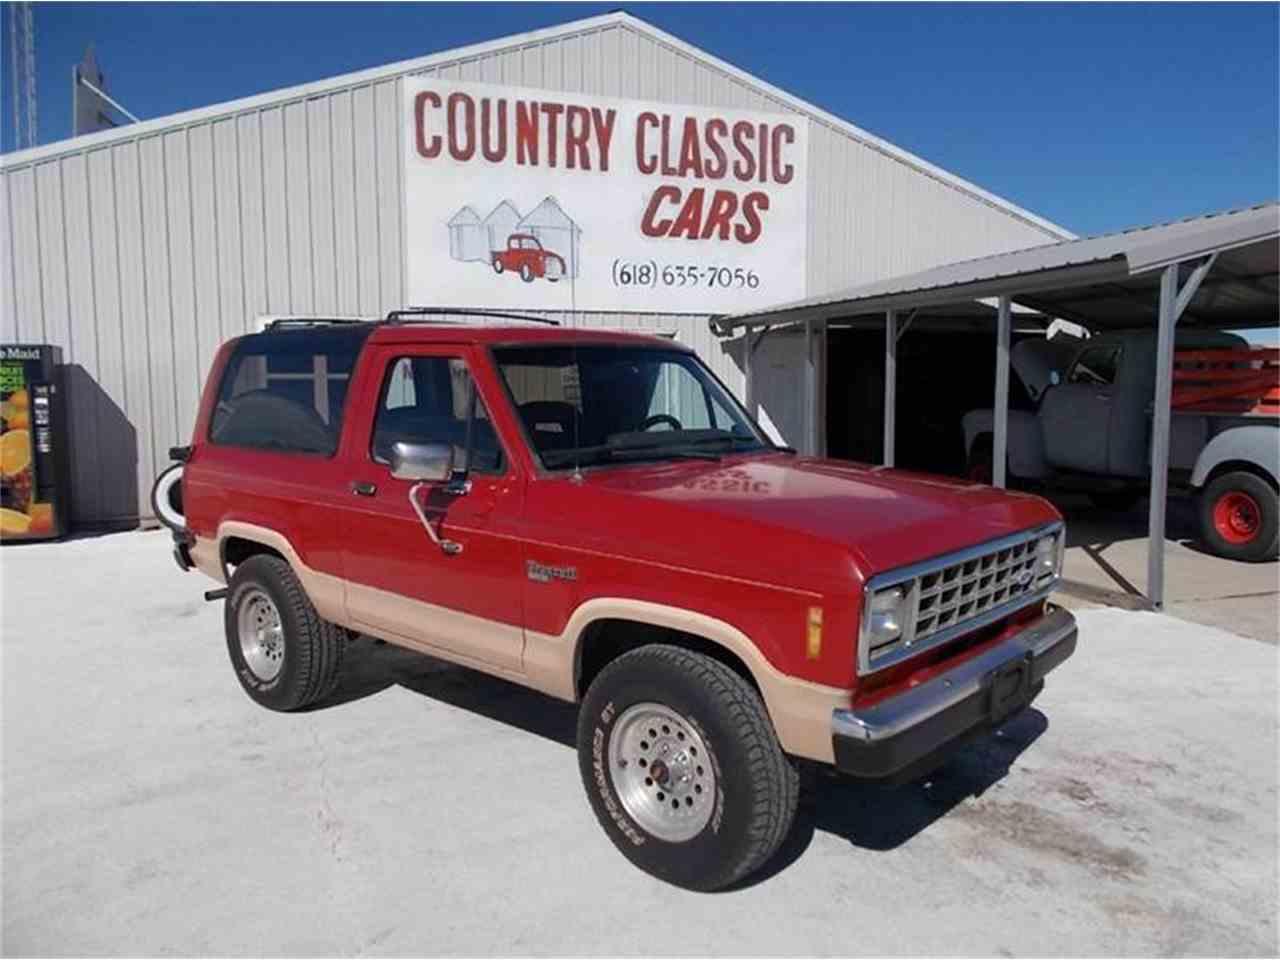 Bronco Ii 1983 1997 Ford 4 Available Via Shop The Cc959394 Cc1035550 10449 1988